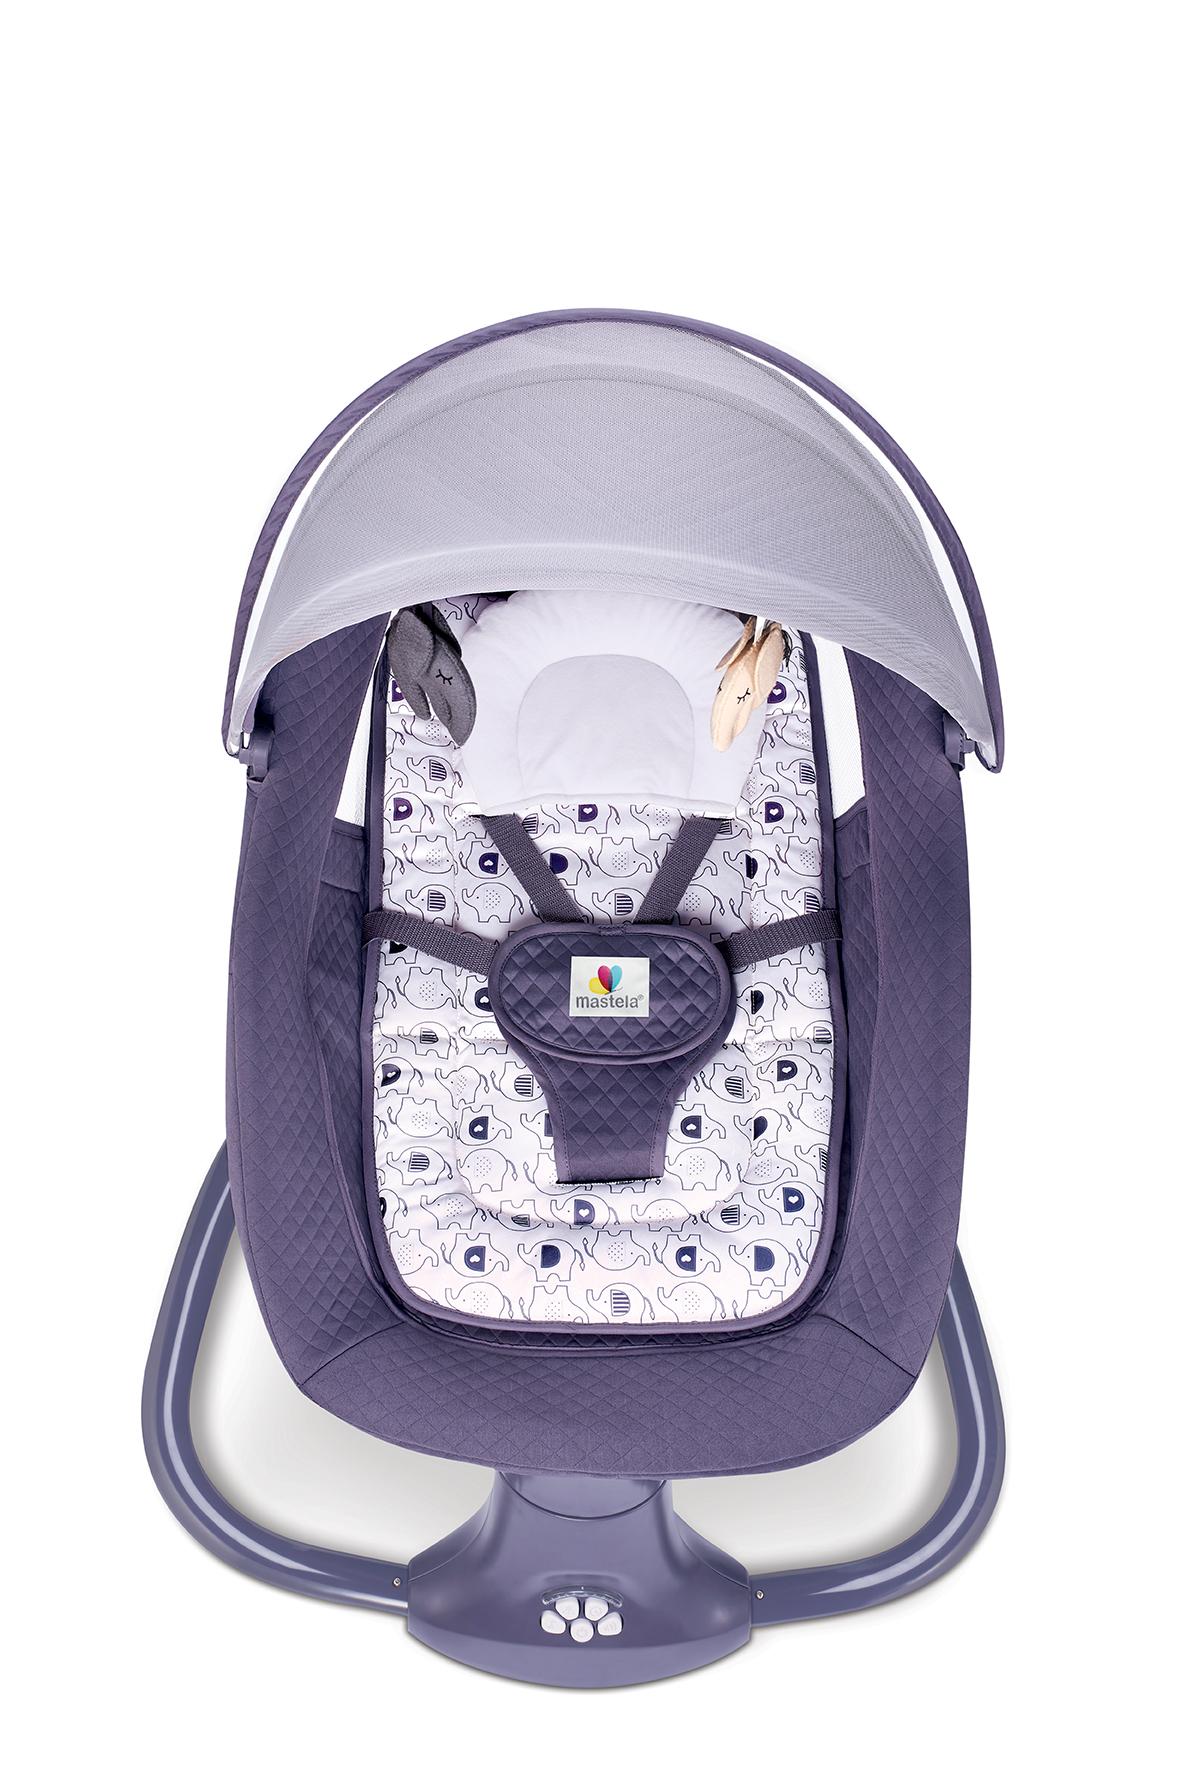 Mothercare | Mastela 3 In1 Swing 8107 Grey